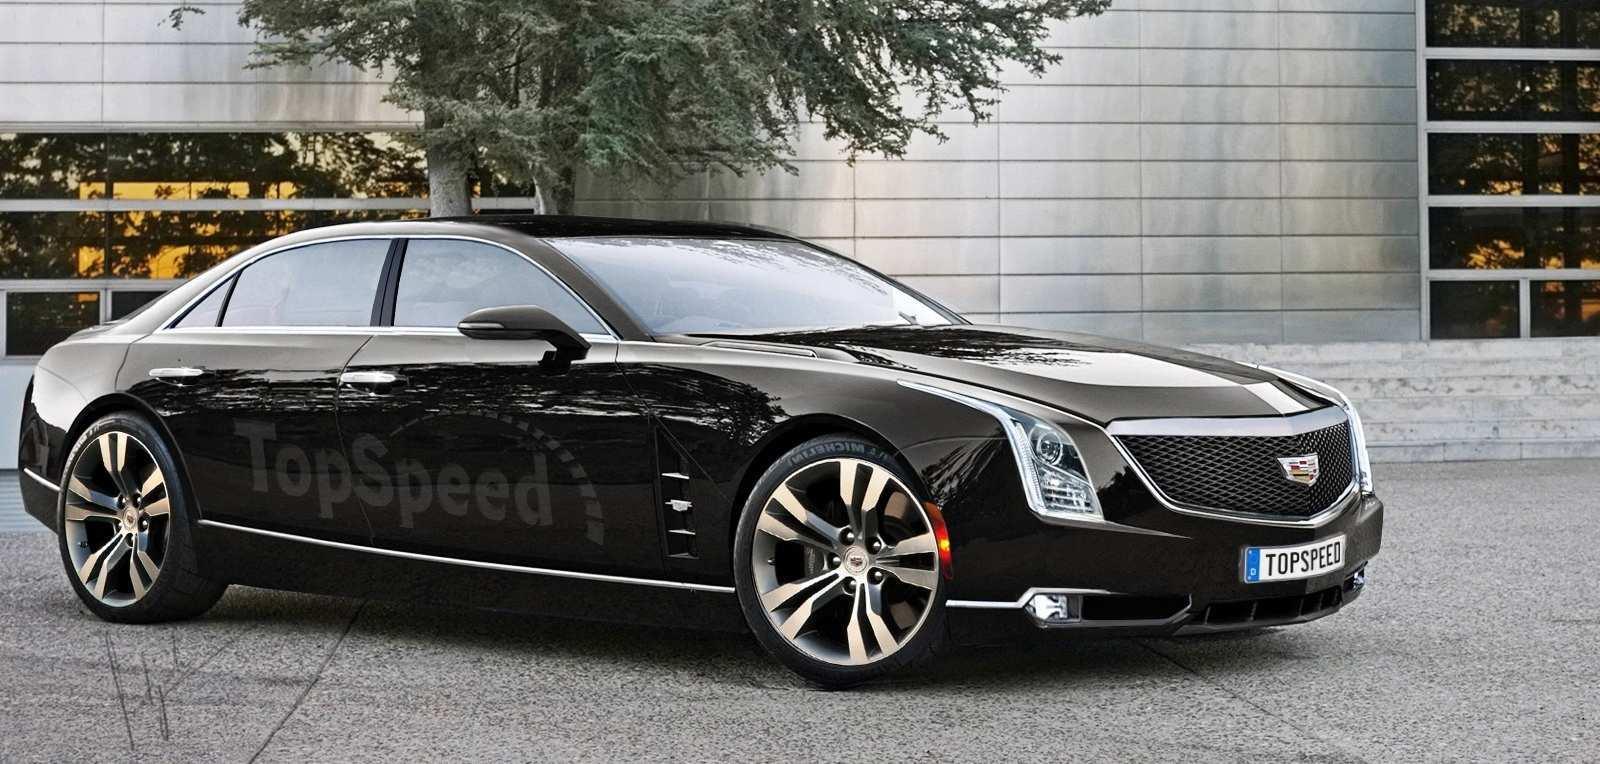 23 Best Review 2020 Cadillac Xlr History with 2020 Cadillac Xlr